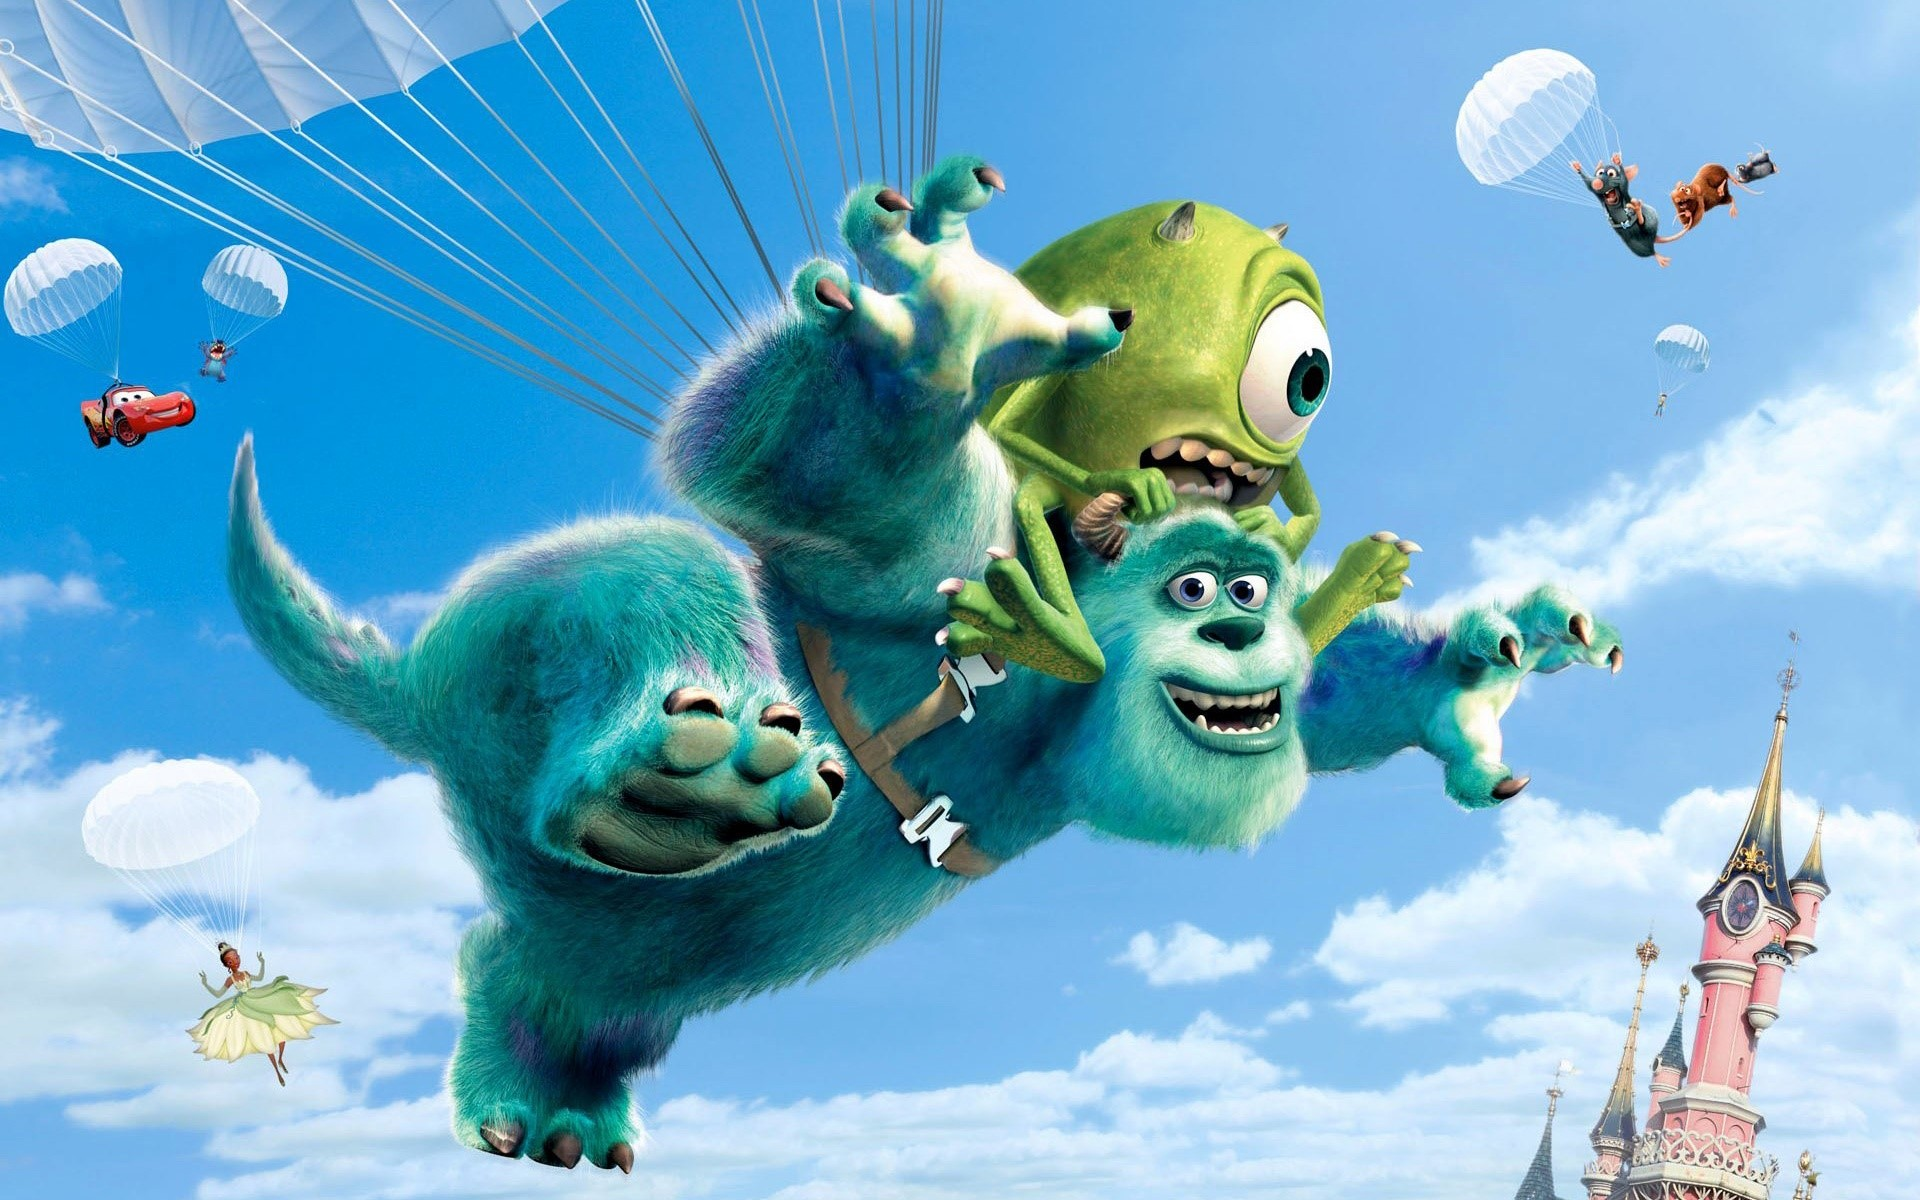 Wallpaper Peliculas de Pixar en paracaídas